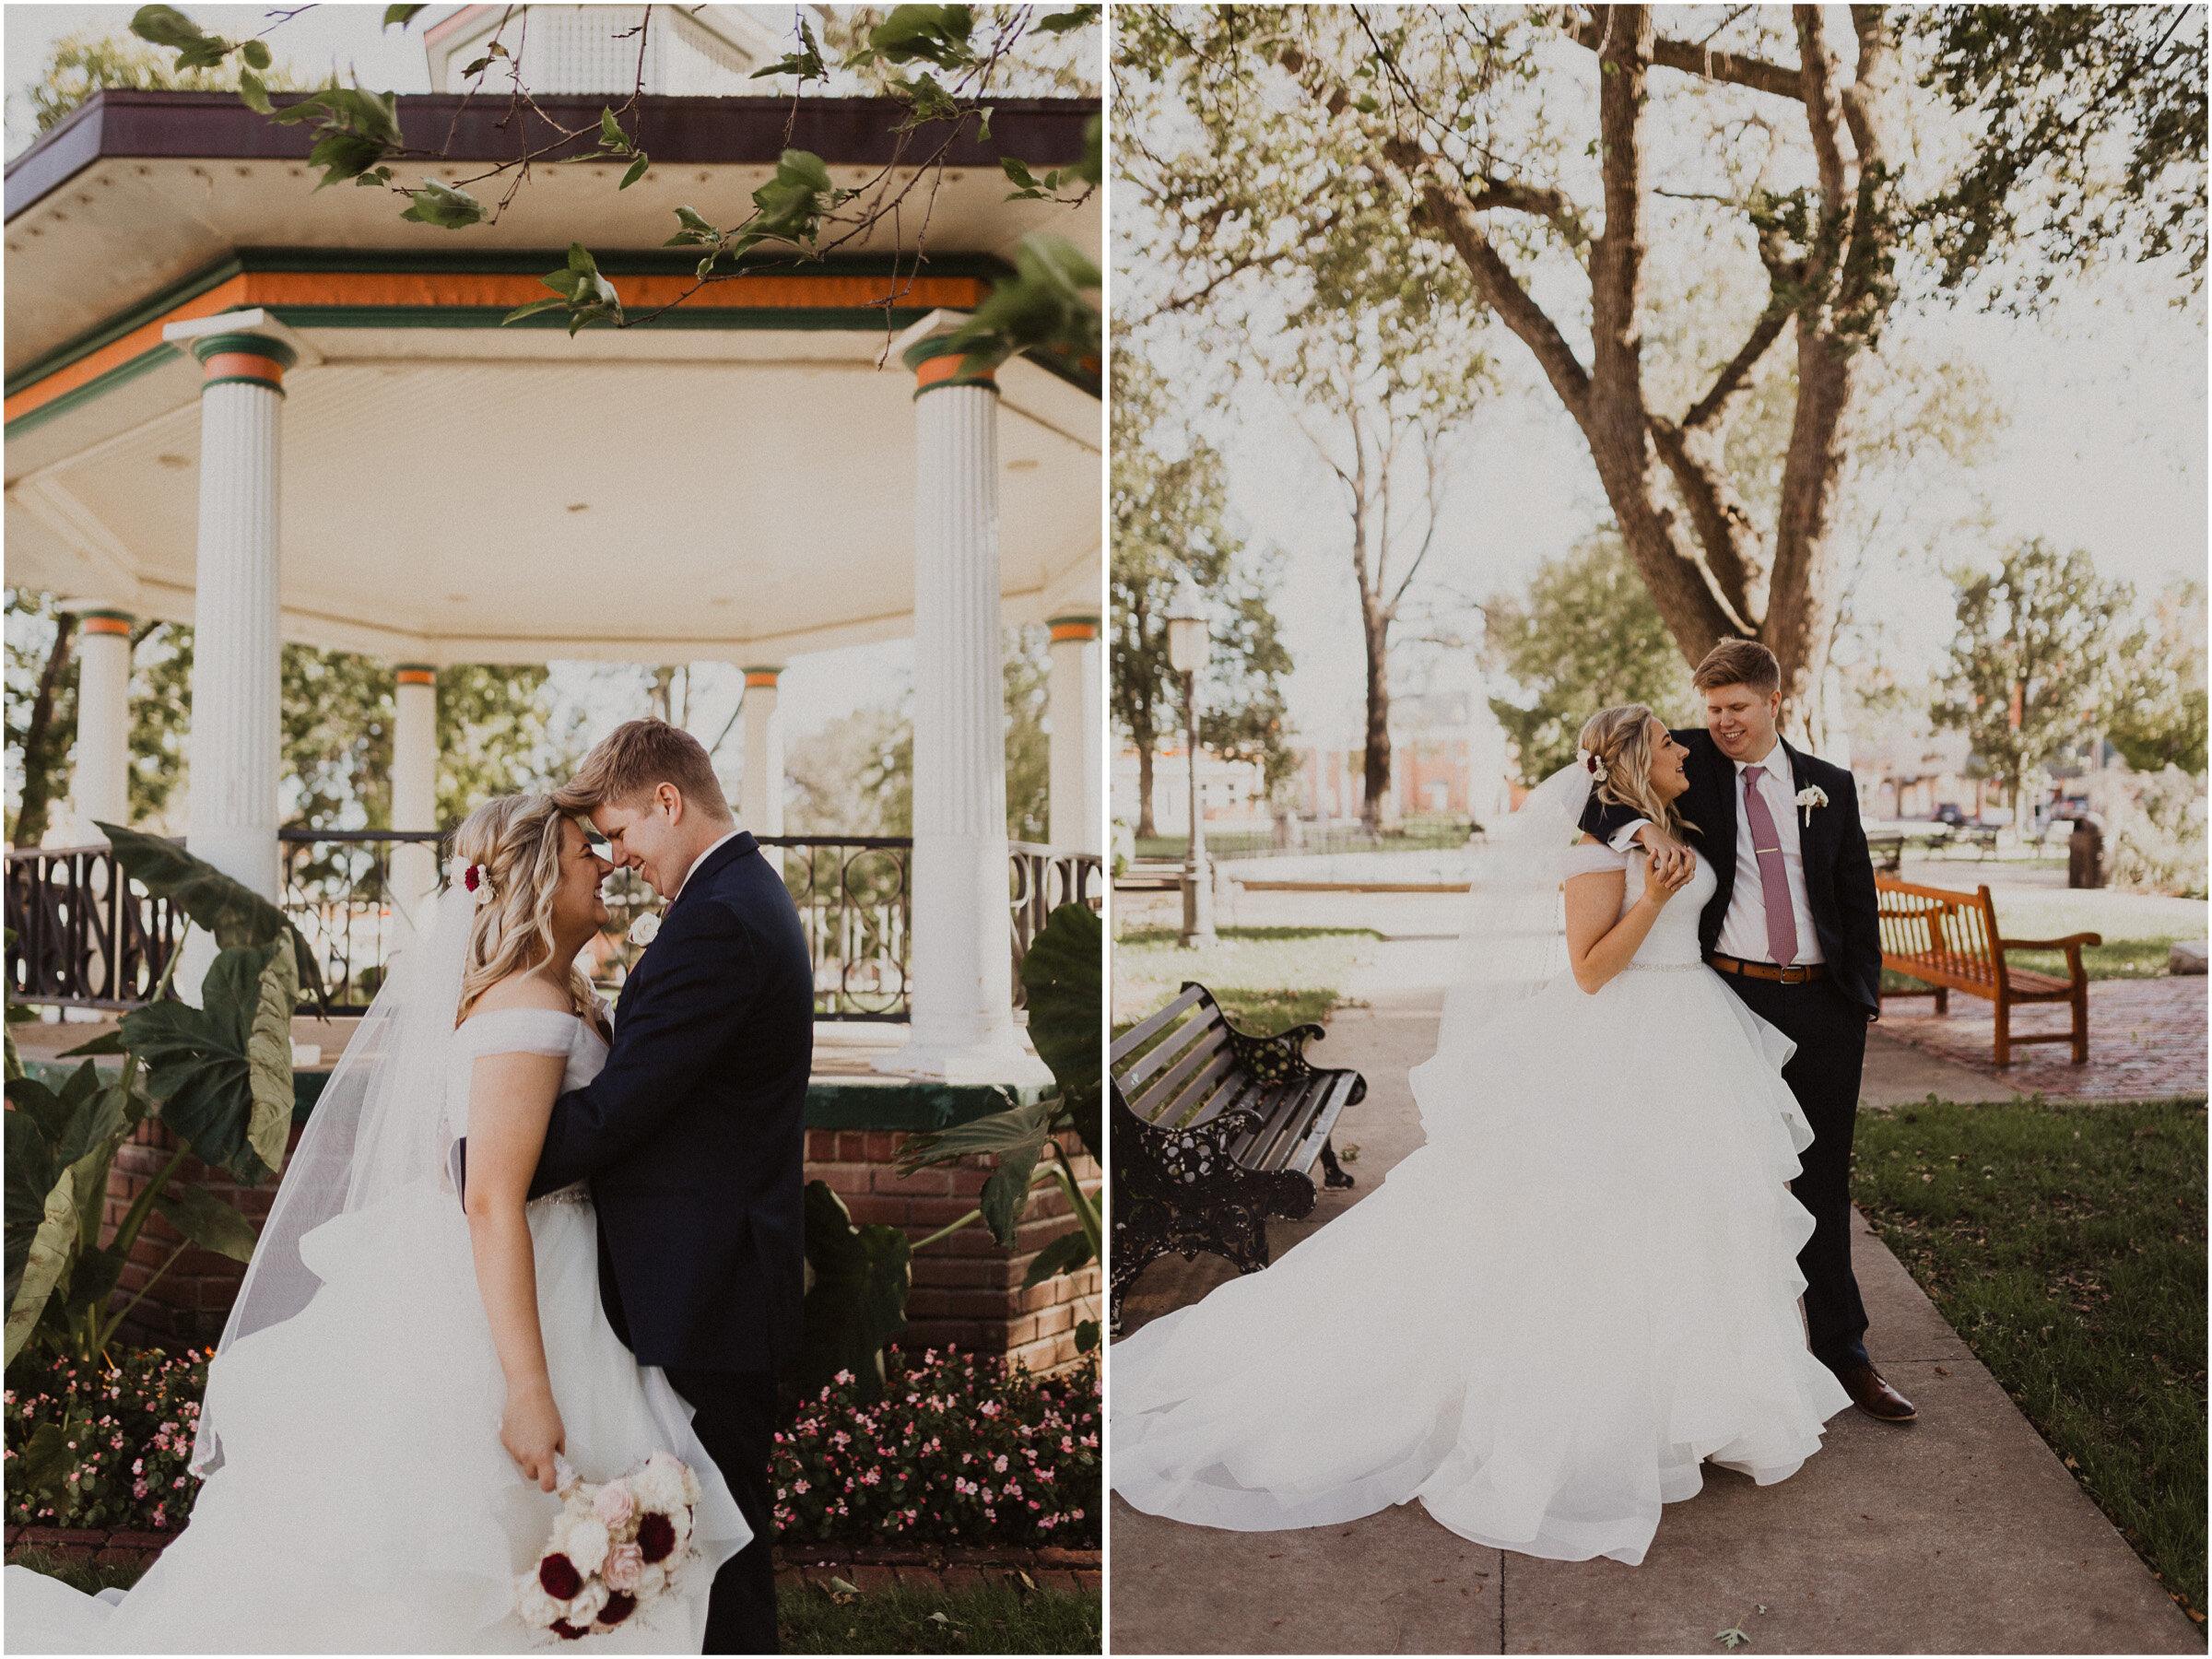 alyssa barletter photography town square paola wedding-18.jpg